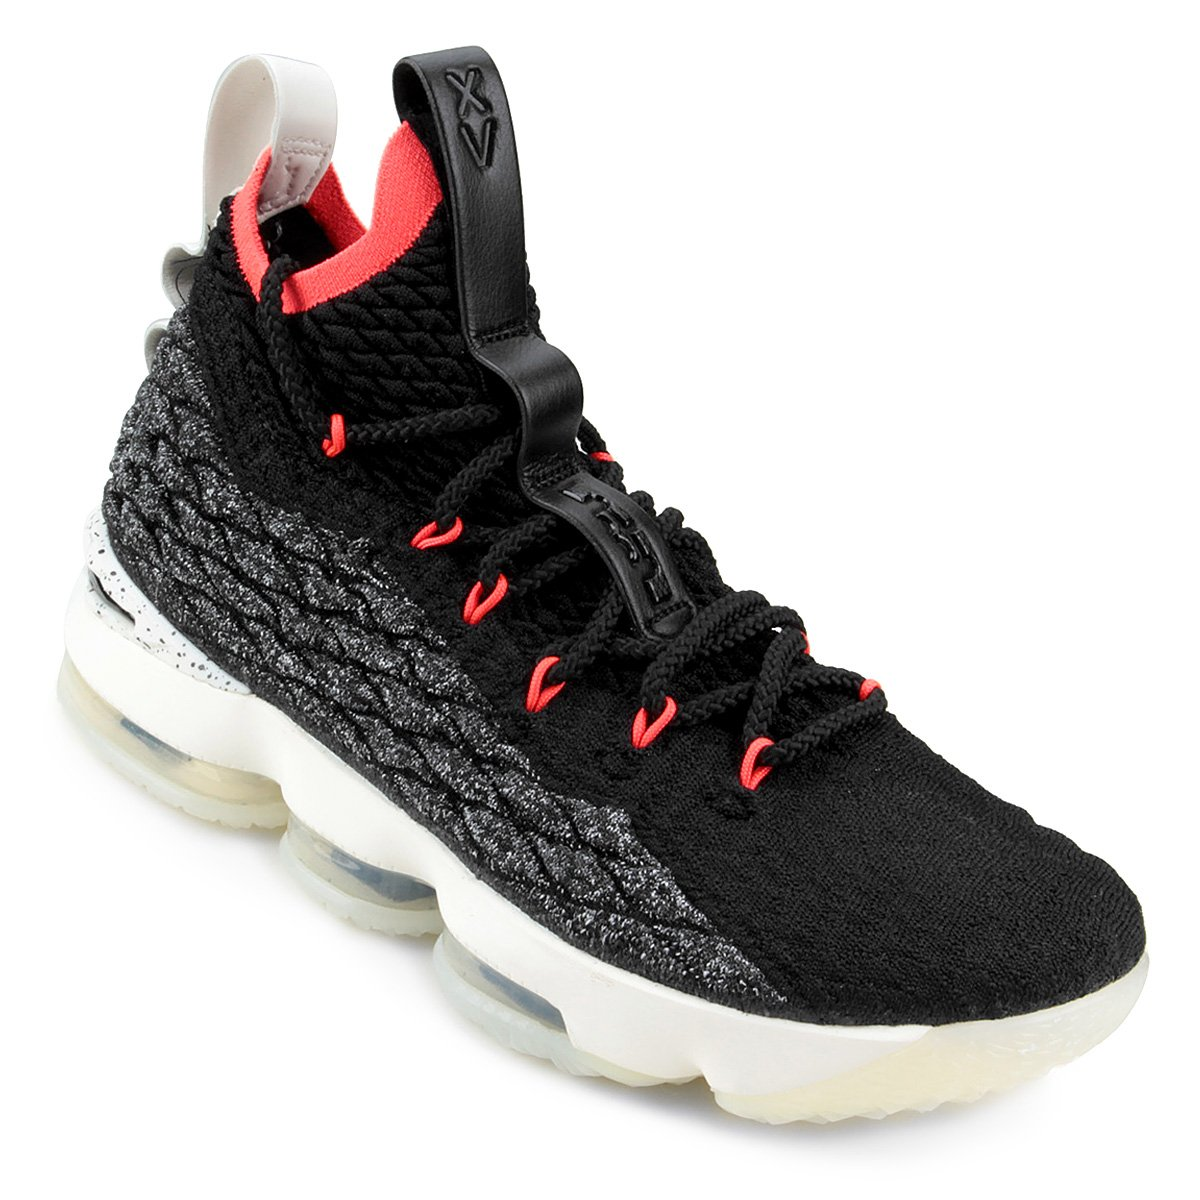 online retailer 72afb 81103 Tênis Nike Lebron XV Machine 61 Masculino | Loja NBA